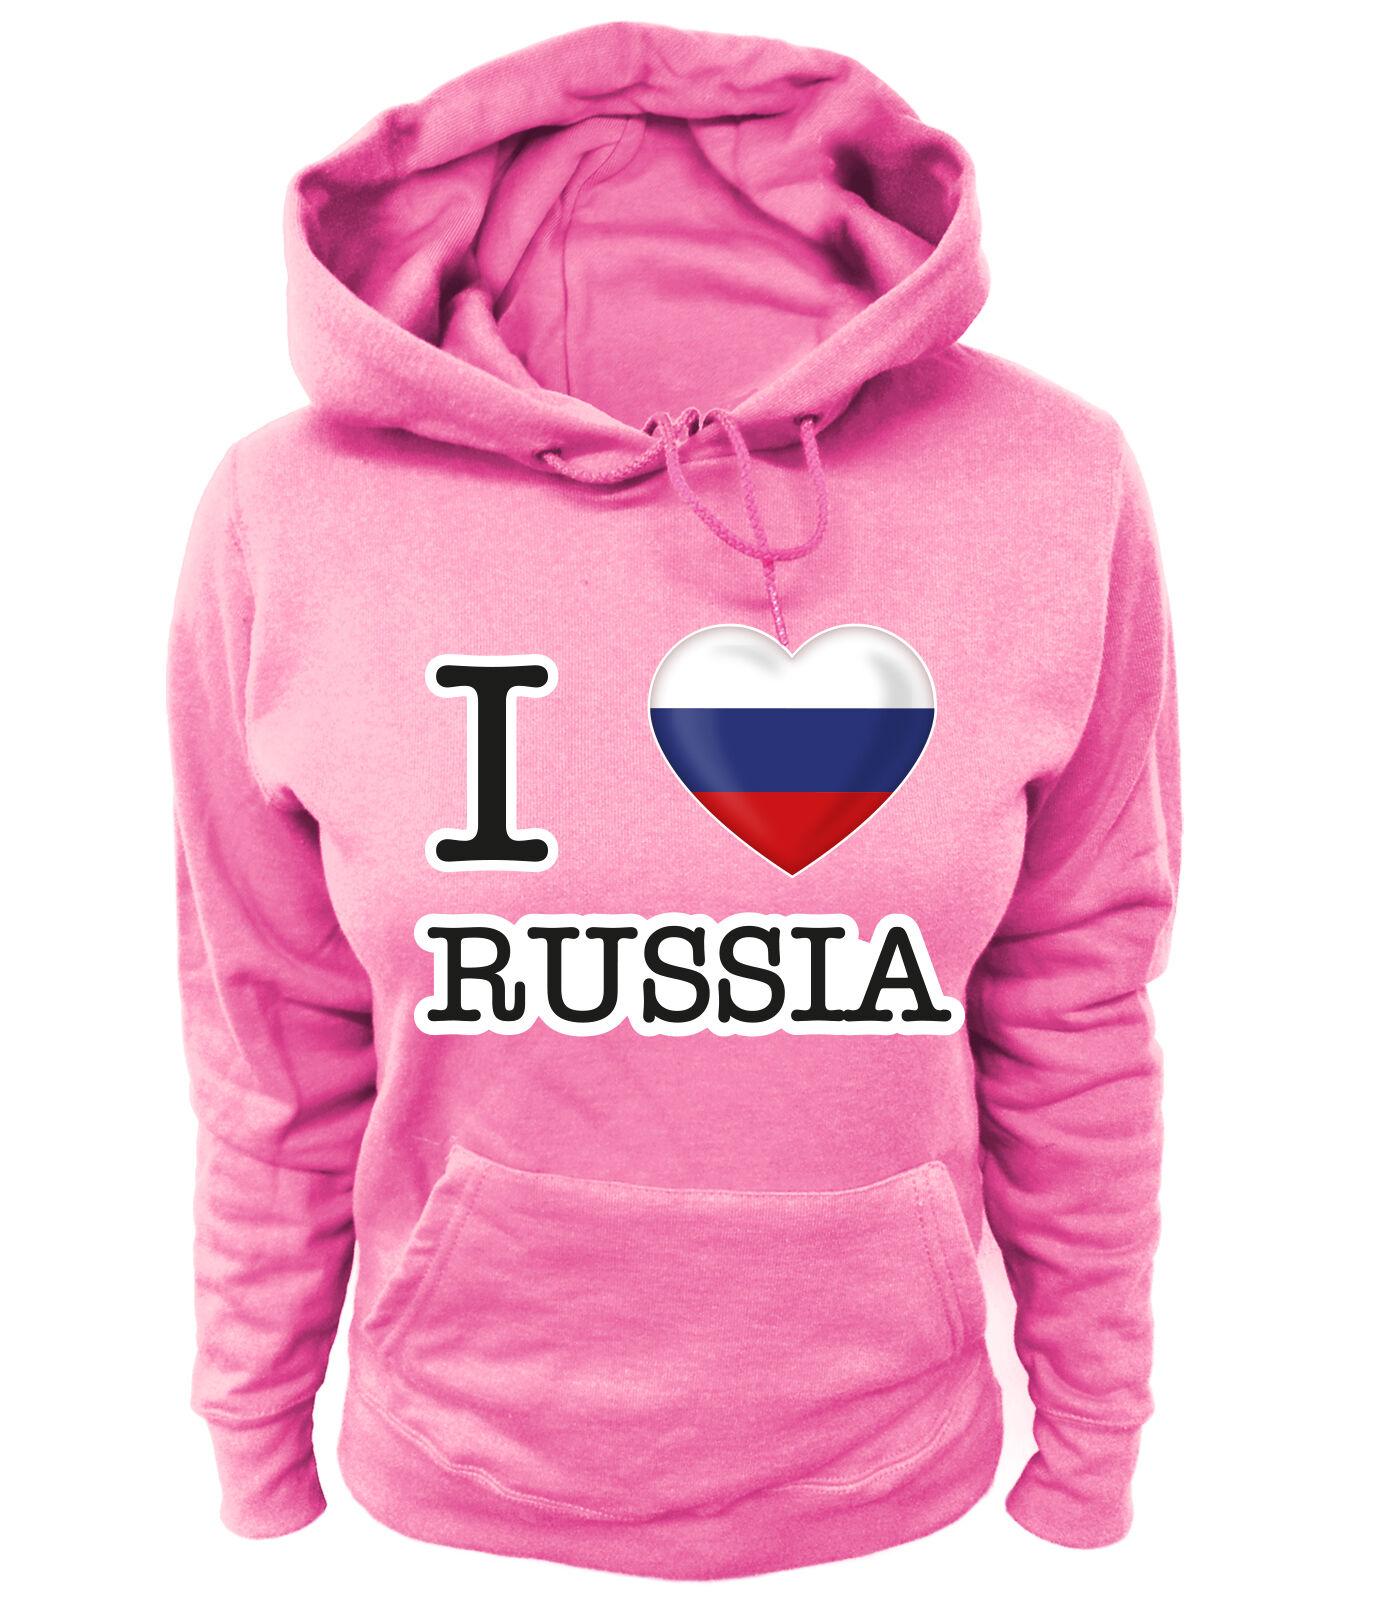 Damen Hoodie I LOVE – Россия Russland Russia Moskau RUS Fußball Soccer DG